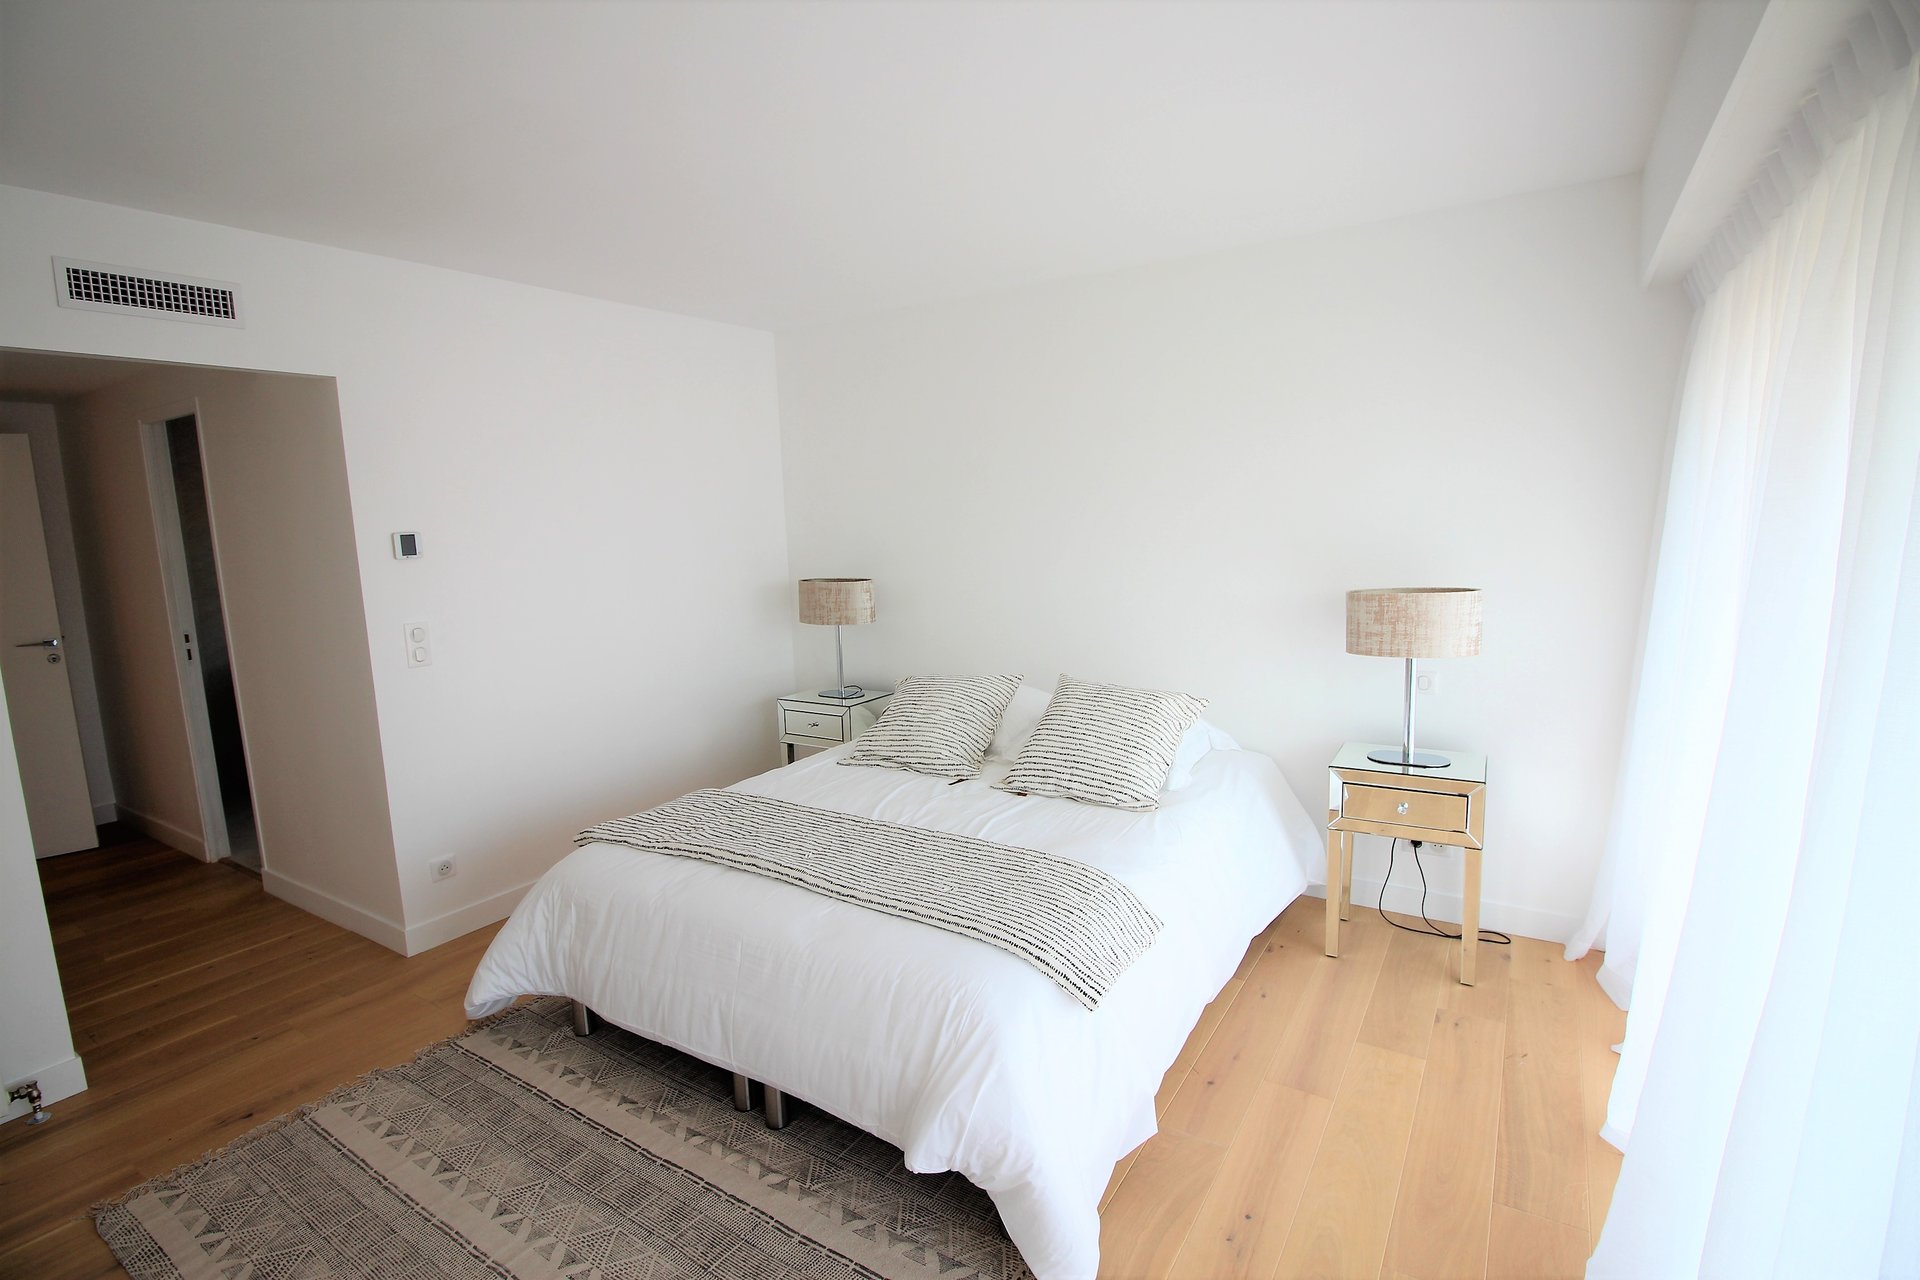 Cannes, Basse-Californie, 2 bedrooms apartment, top floor, terrace